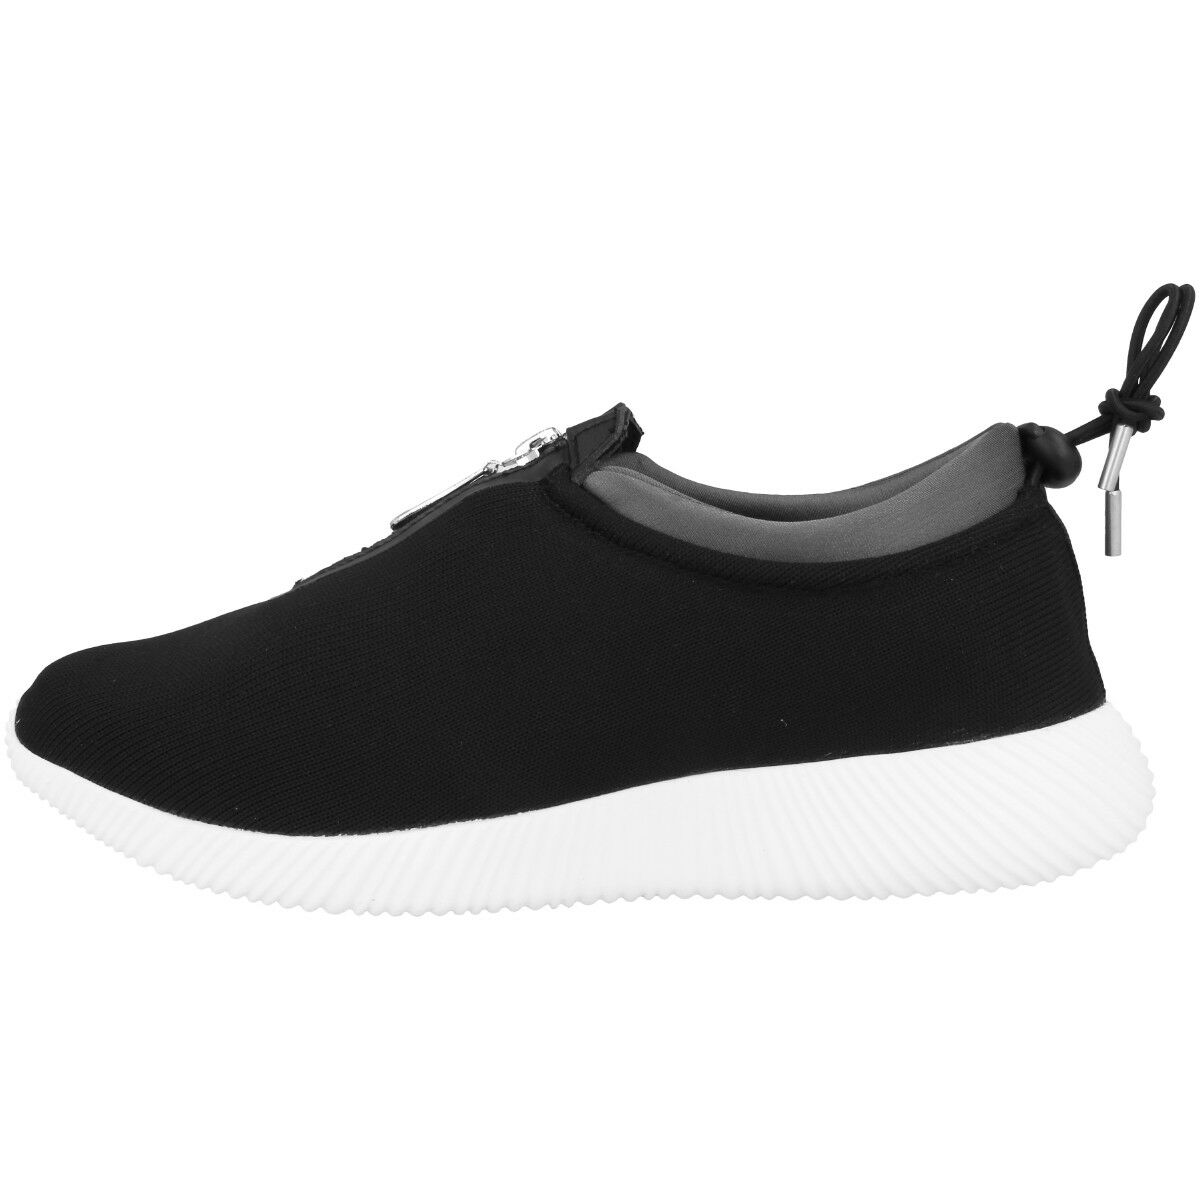 Chung Shi Duxfree Aruba Donne chaussures femmes Casual Zip baskets Nere 8820010